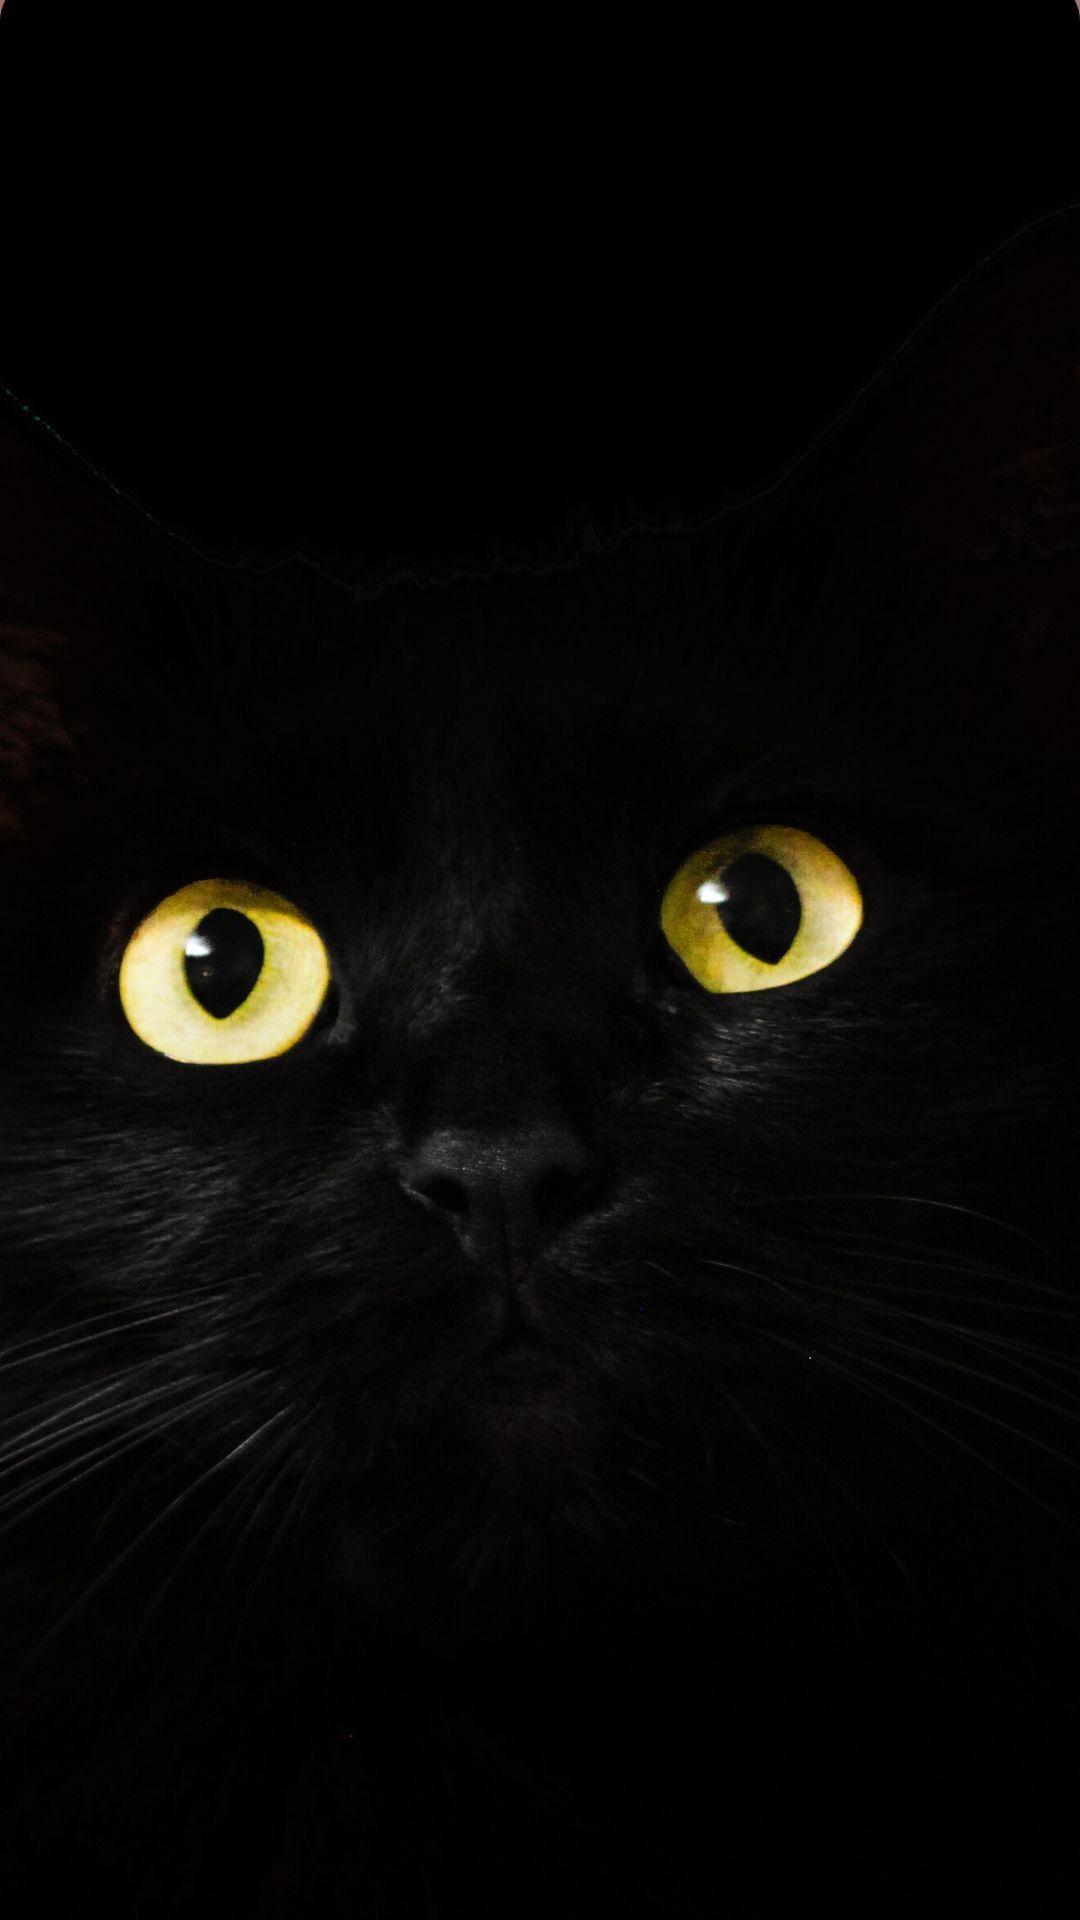 Iphone Black Cat Wallpaper Black Cat Pictures Black Cat Drawing Cute Black Cats